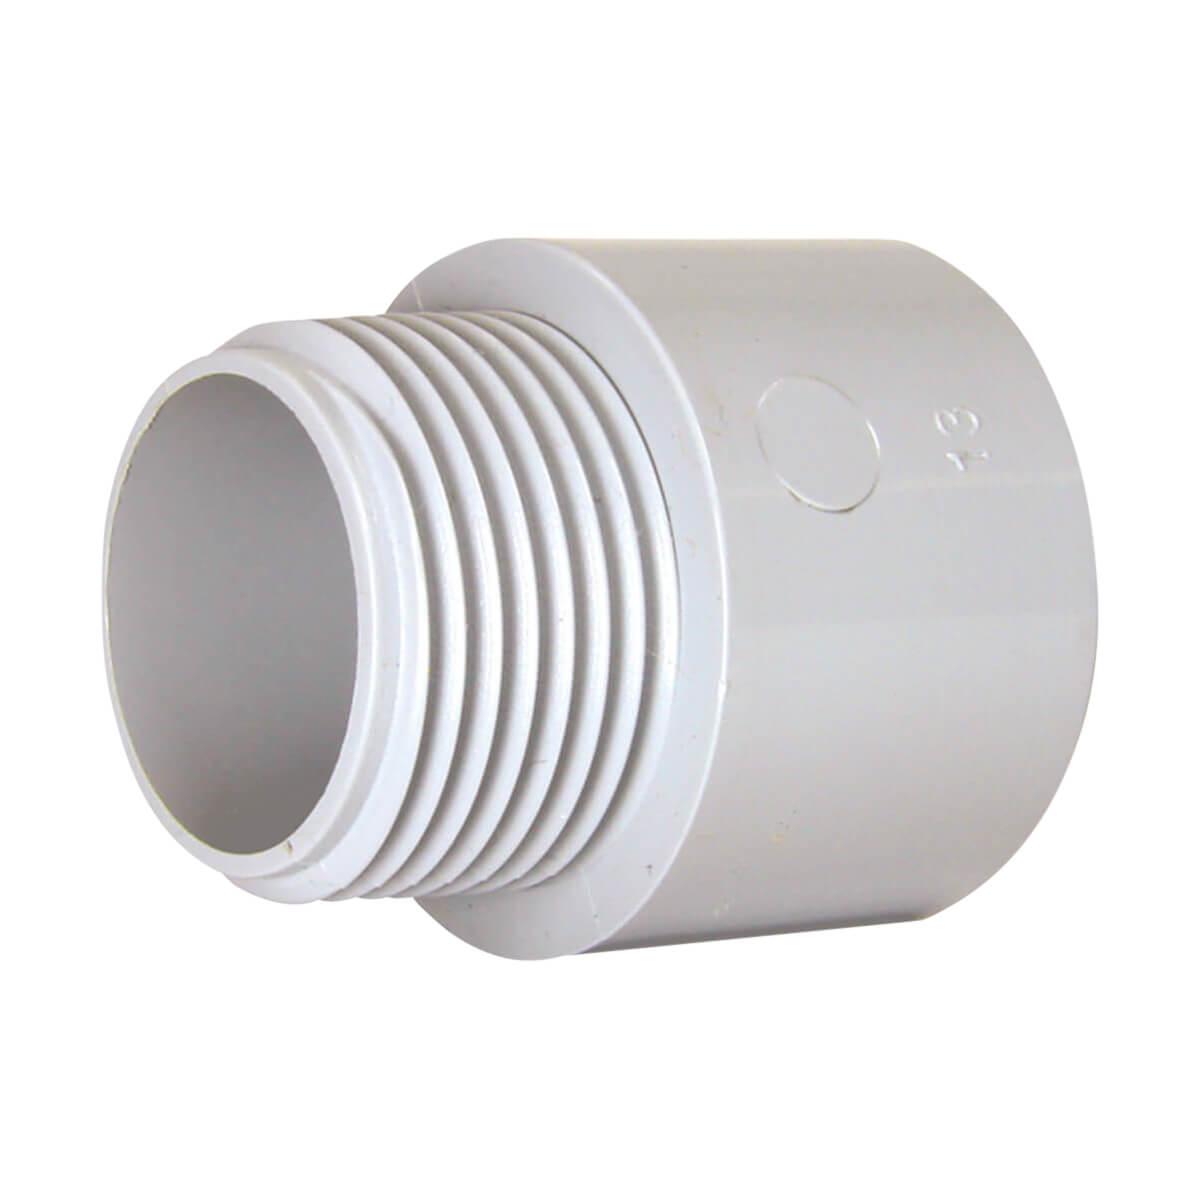 PVC Conduit Terminal Adapter - Hub x MPT (M) - 1-1/4-in